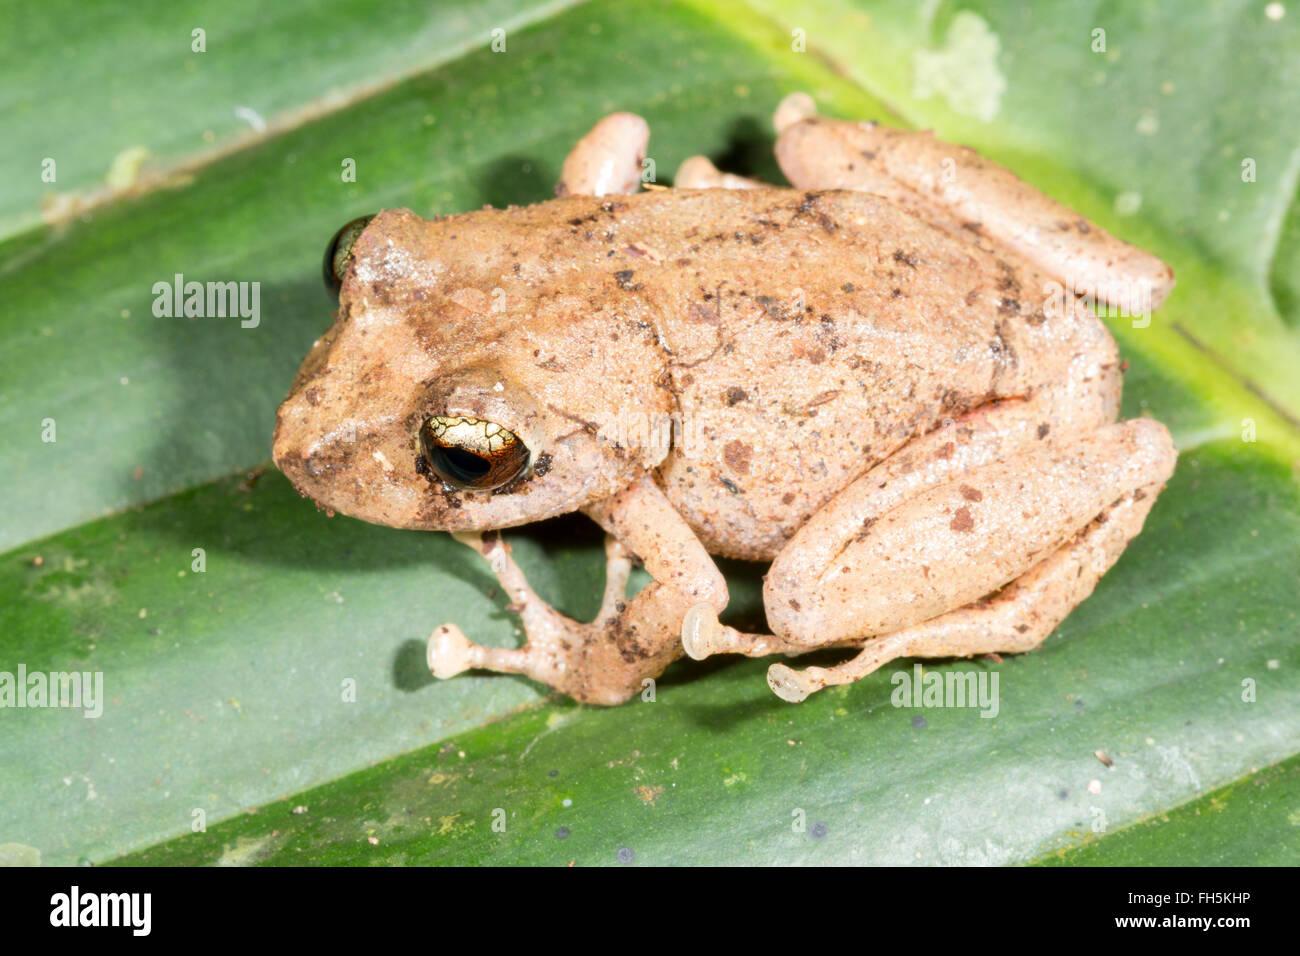 Delius rain frog (Pristimantis delius), in the rainforest, Pastaza province, Ecuador. - Stock Image